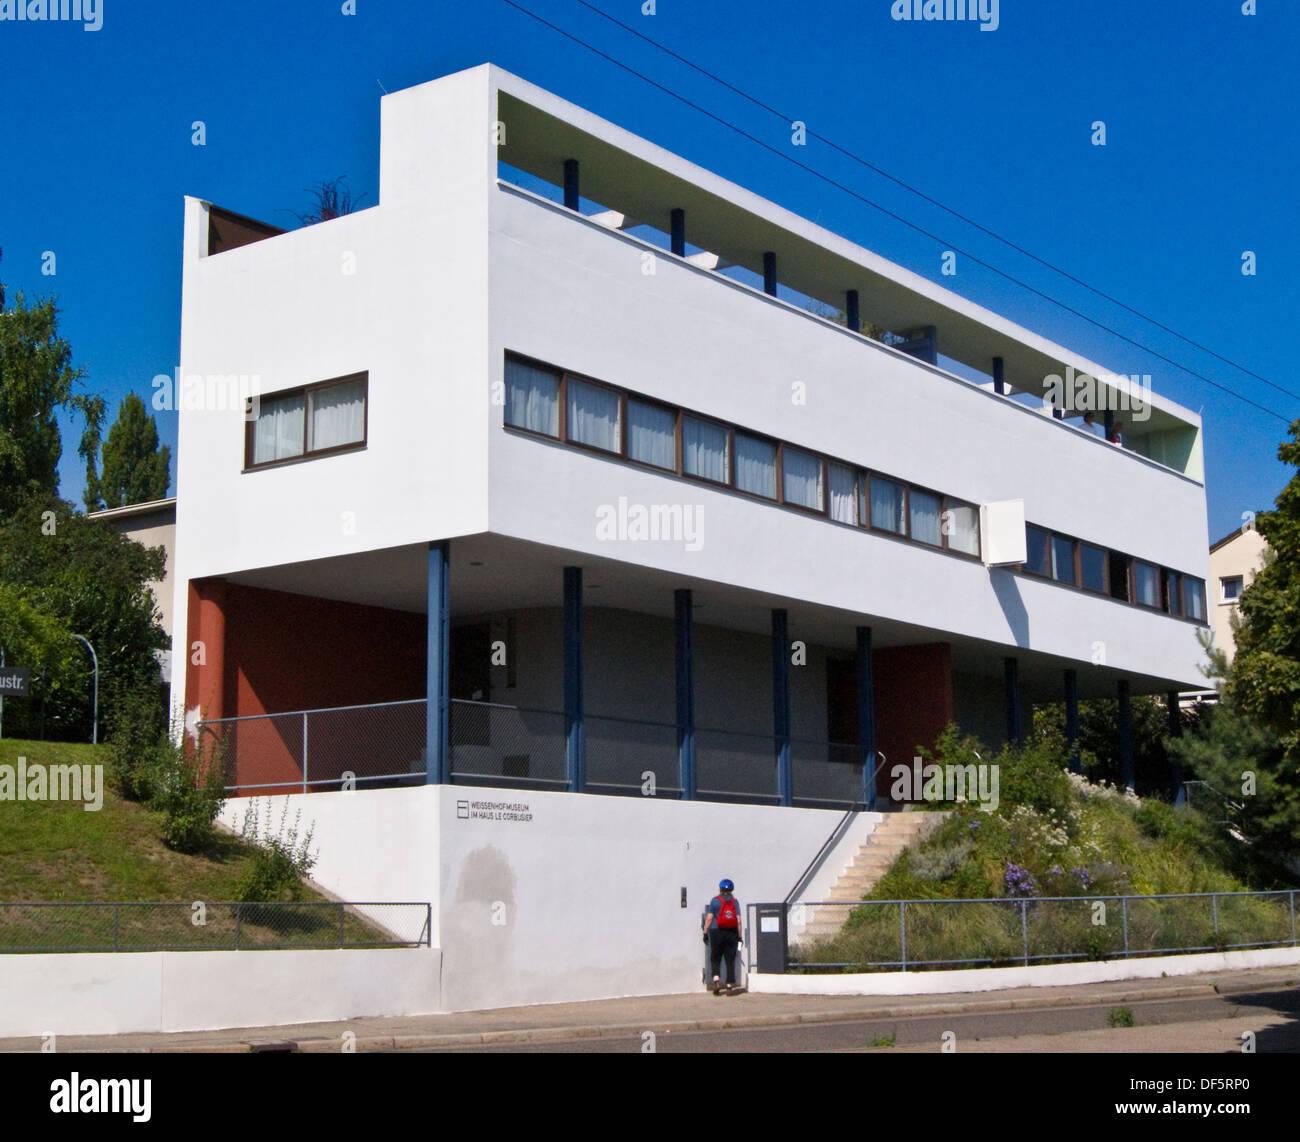 le-corbusier-house-1927-rathenaustrasse-weissenhofsiedlung-weissenhof-DF5RP0.jpg